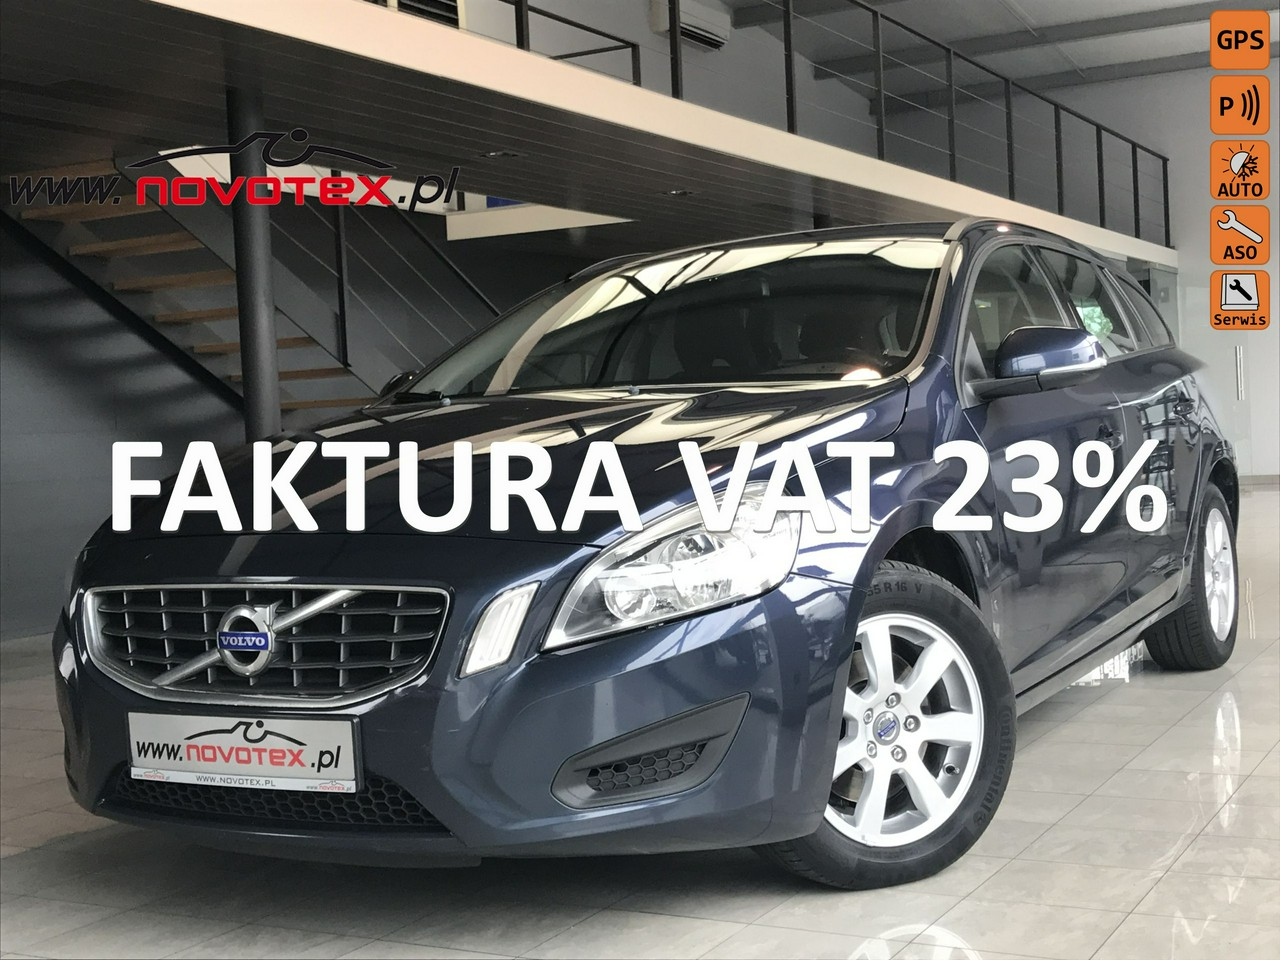 Volvo V60 2.0D*Momentum*navi*177Tkm*serwis w ASO*Gwarancja VIP Service